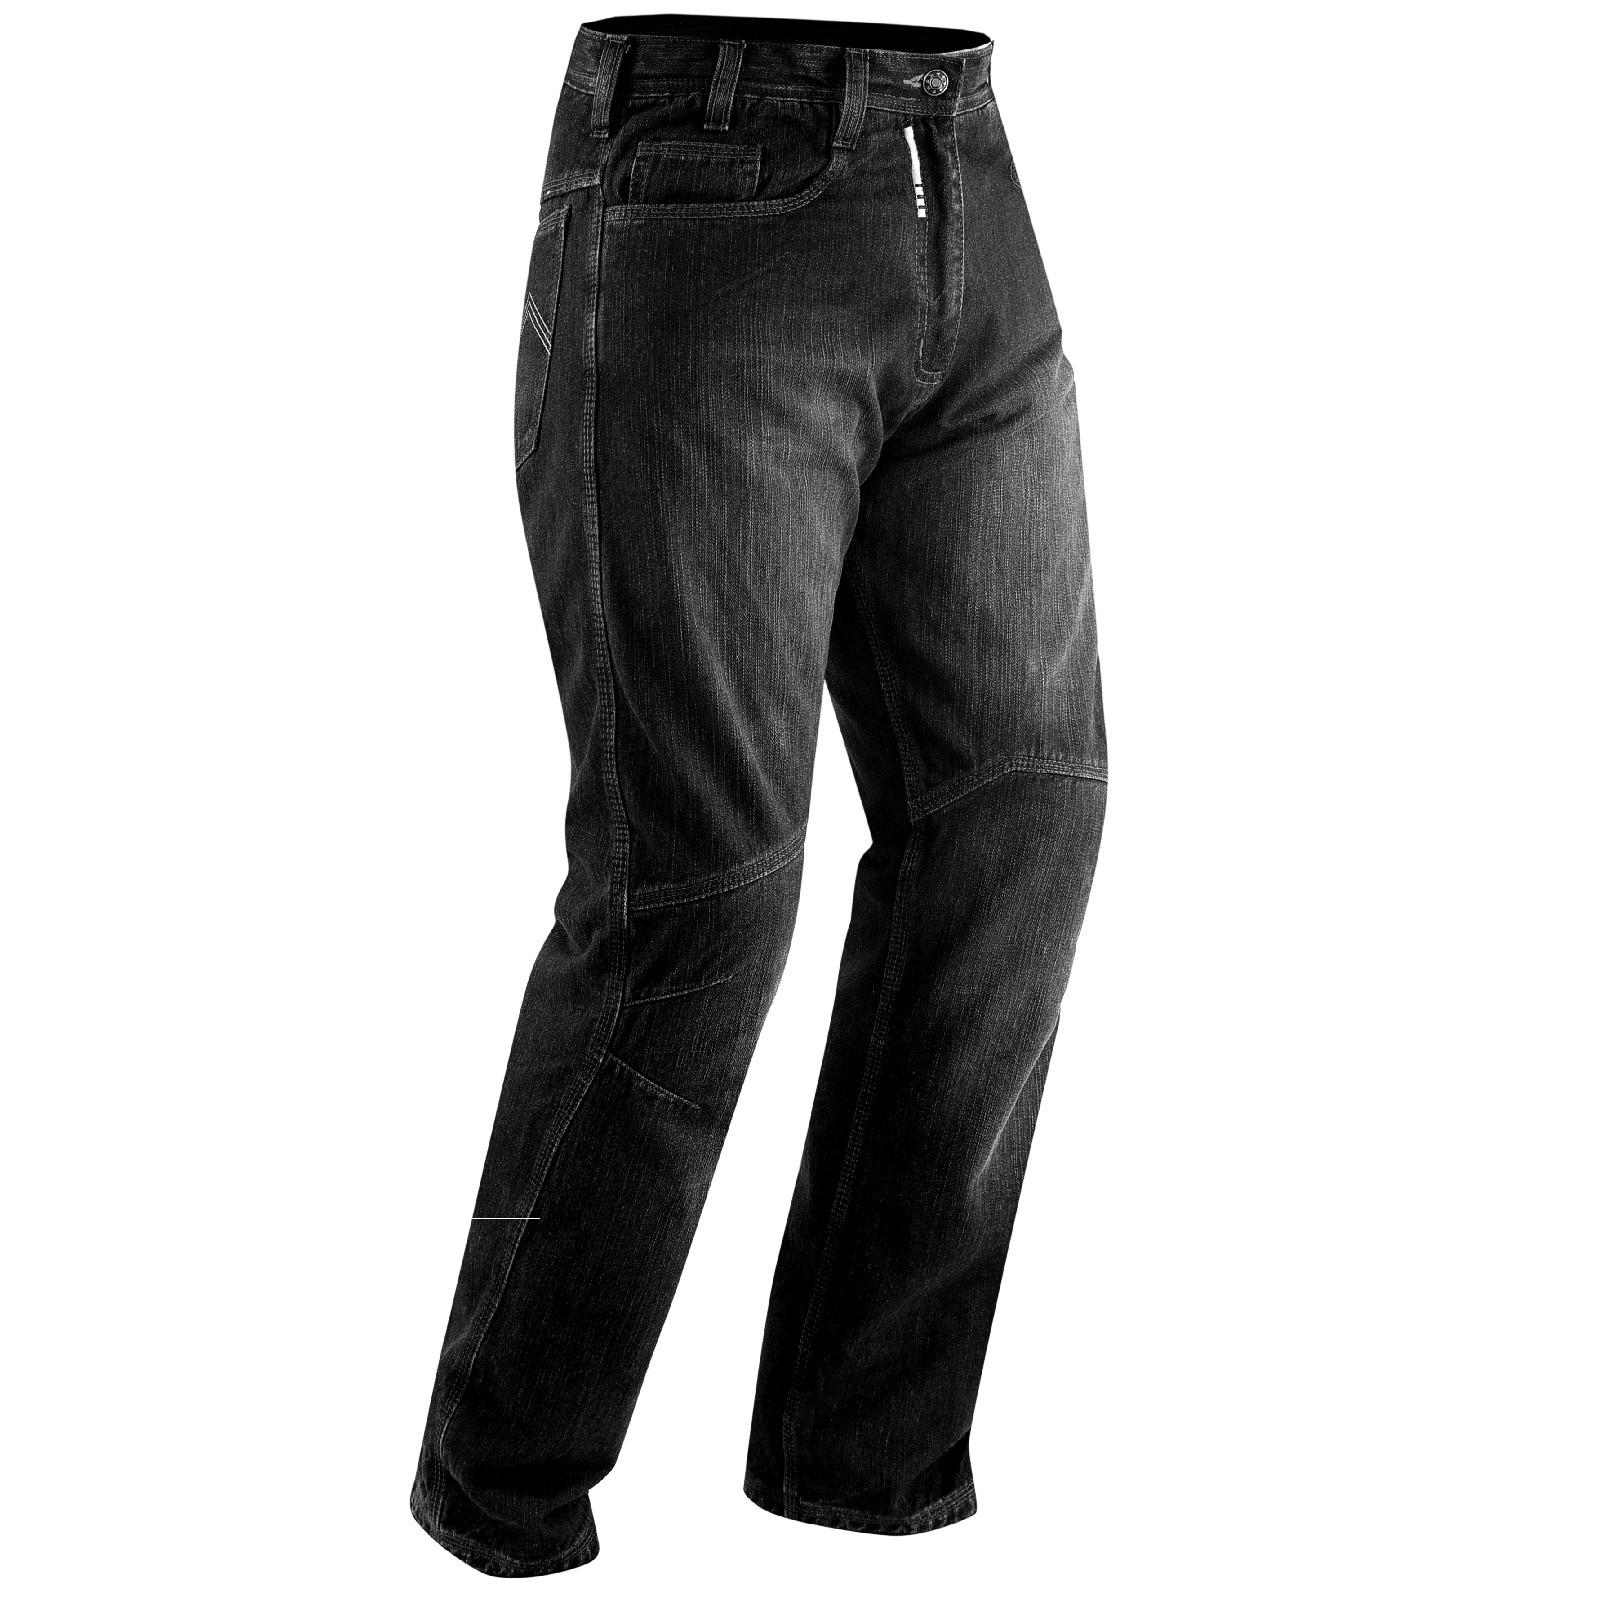 Jeans Moto Pantaloni Protecioni Omologate CE Ginocchia Rinforzi Fianchi Nero